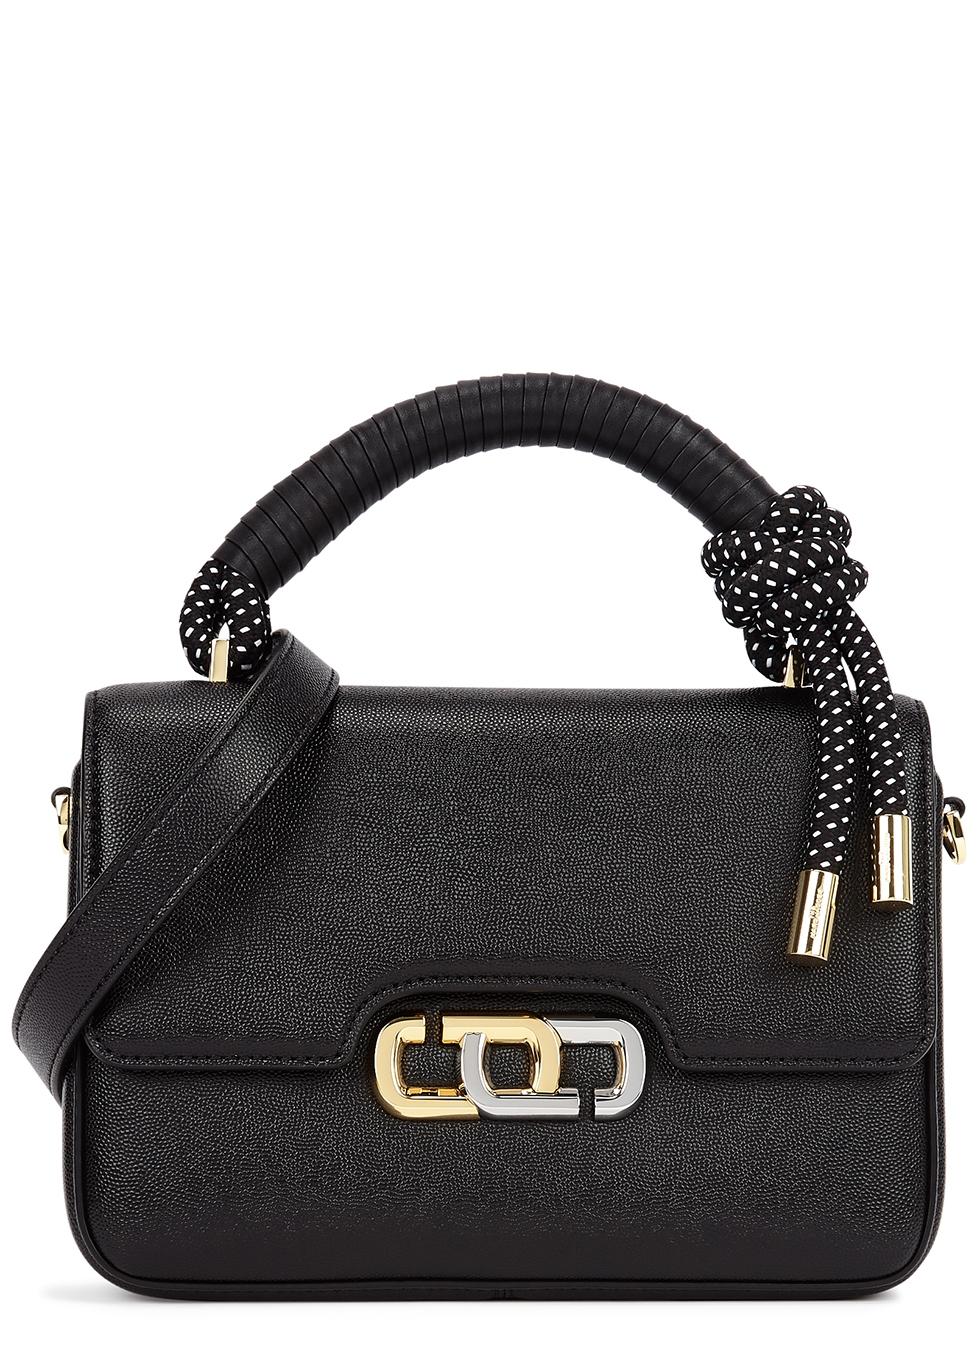 The J Link black leather top handle bag